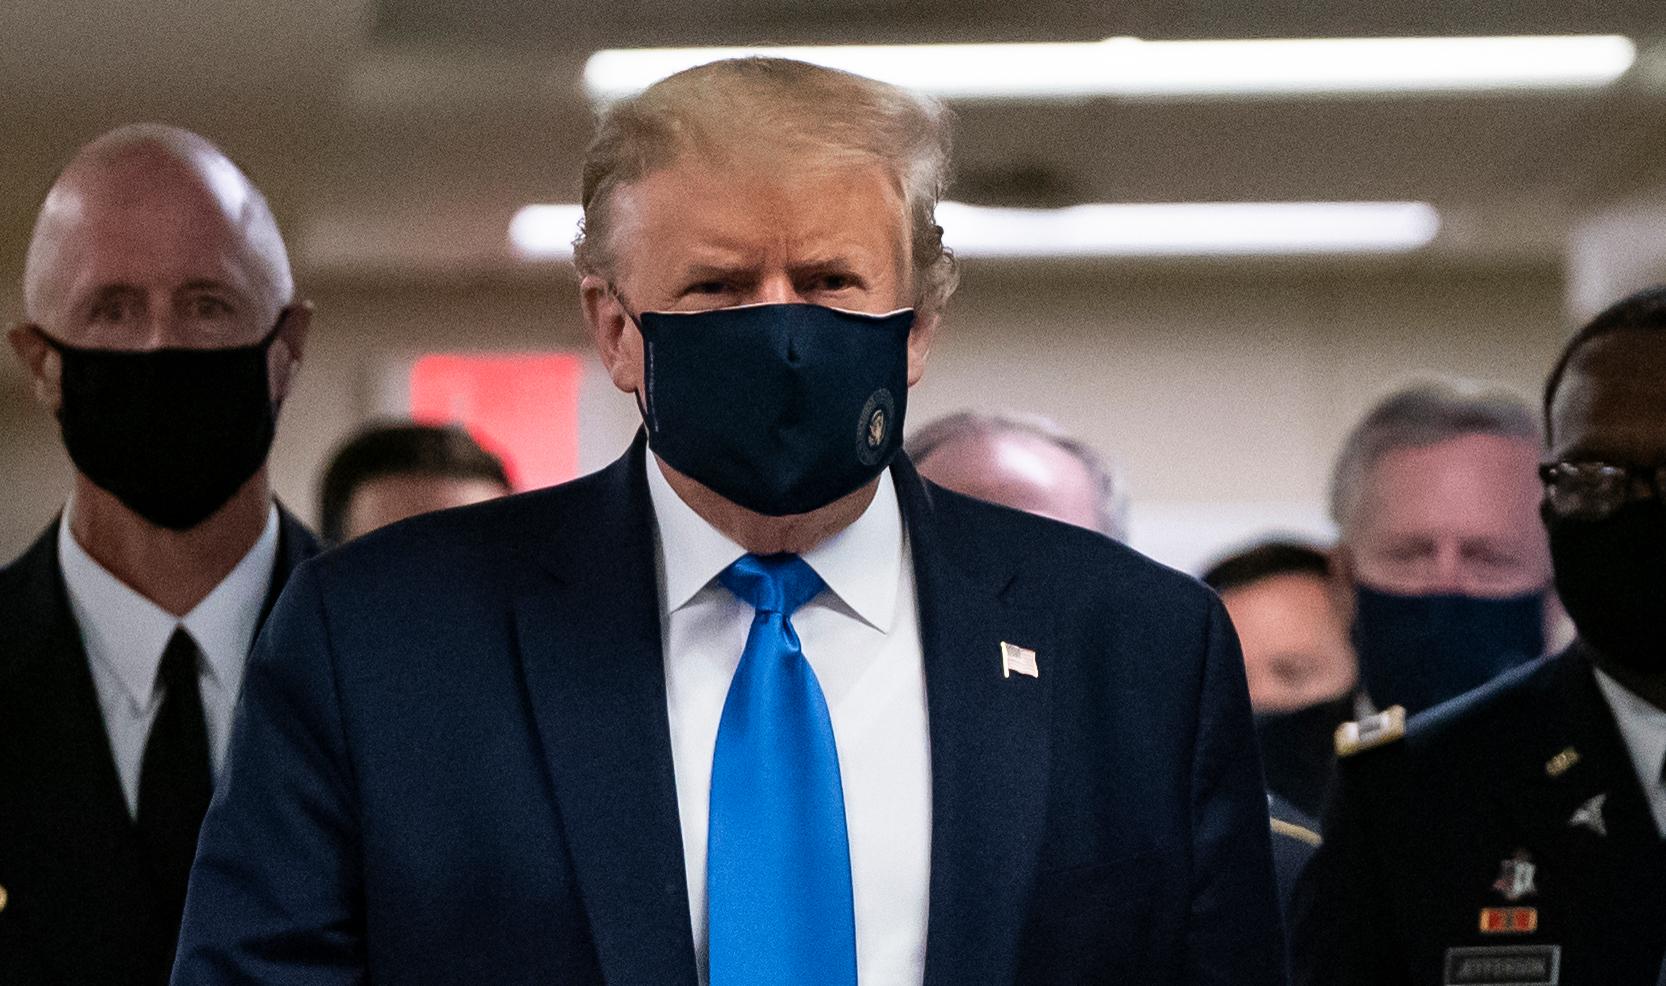 Trump wearing mask